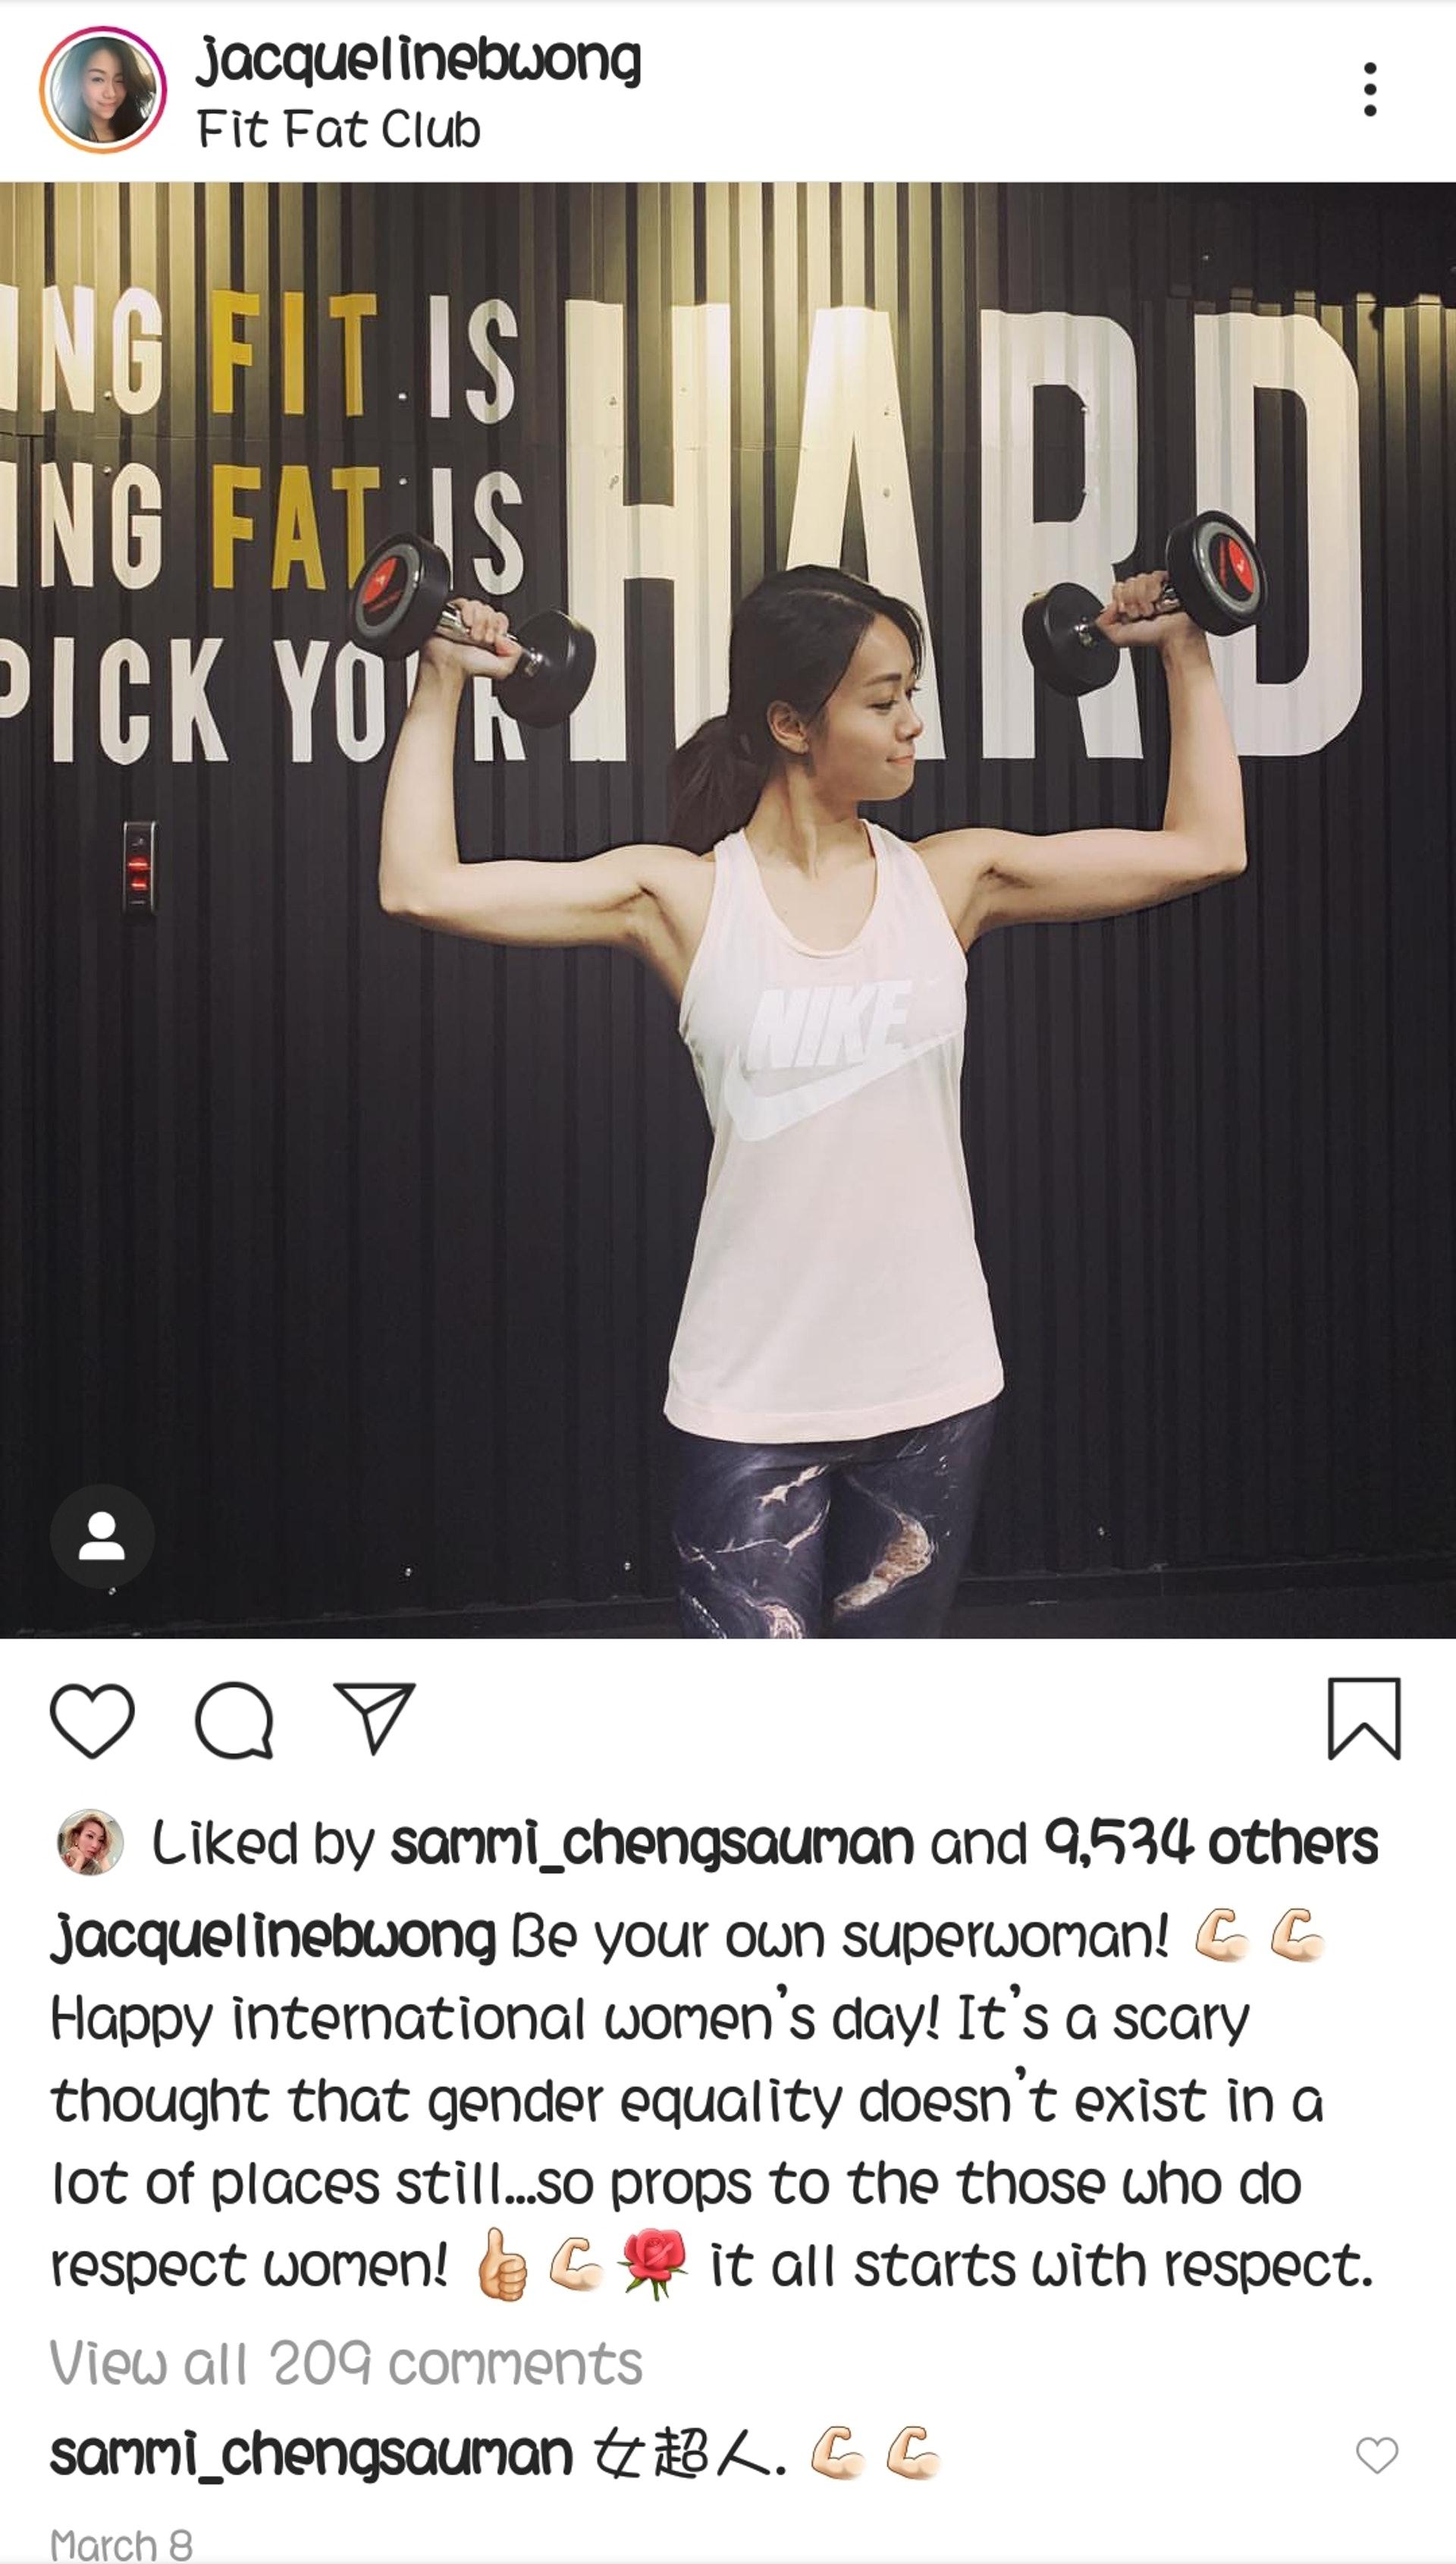 Sammi在黃心穎IG留言稱讚對方是女超人,可惜對方竟然是情婦。(黃心穎IG)